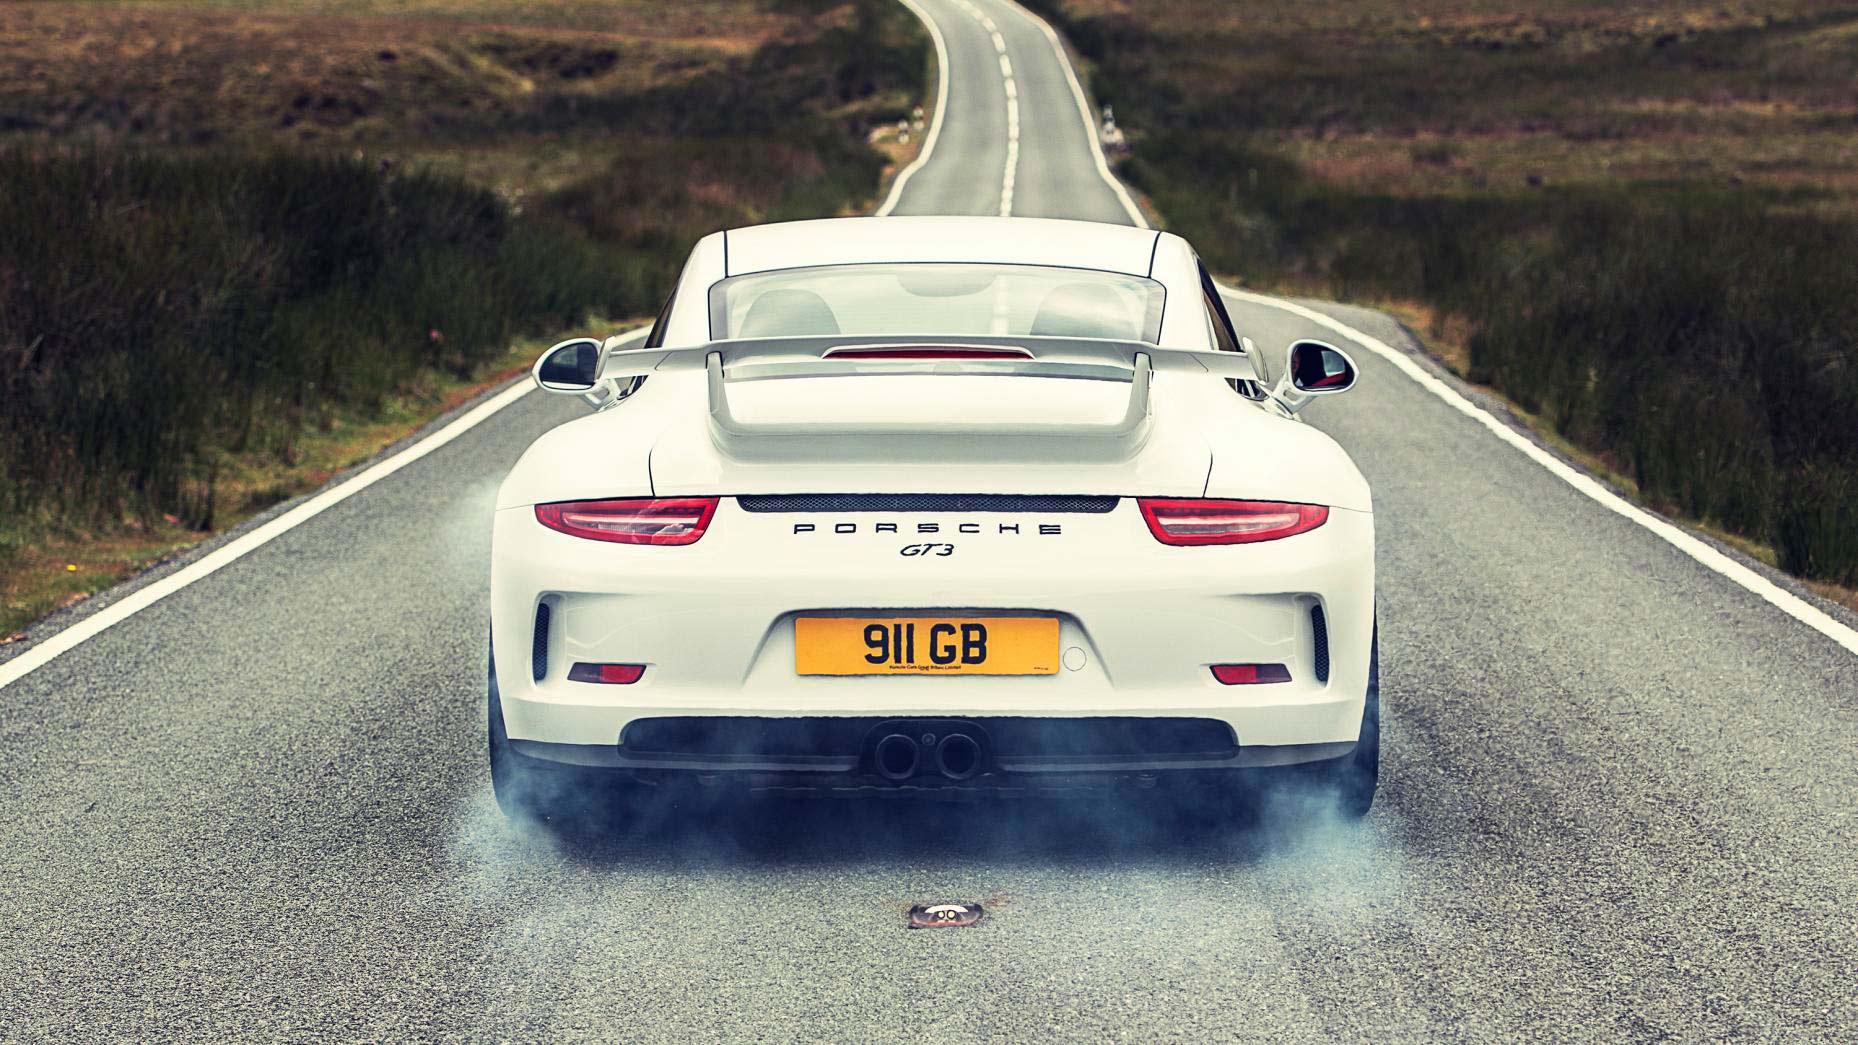 Porsche 911 GT3 arrancando sin perder apenas tracción